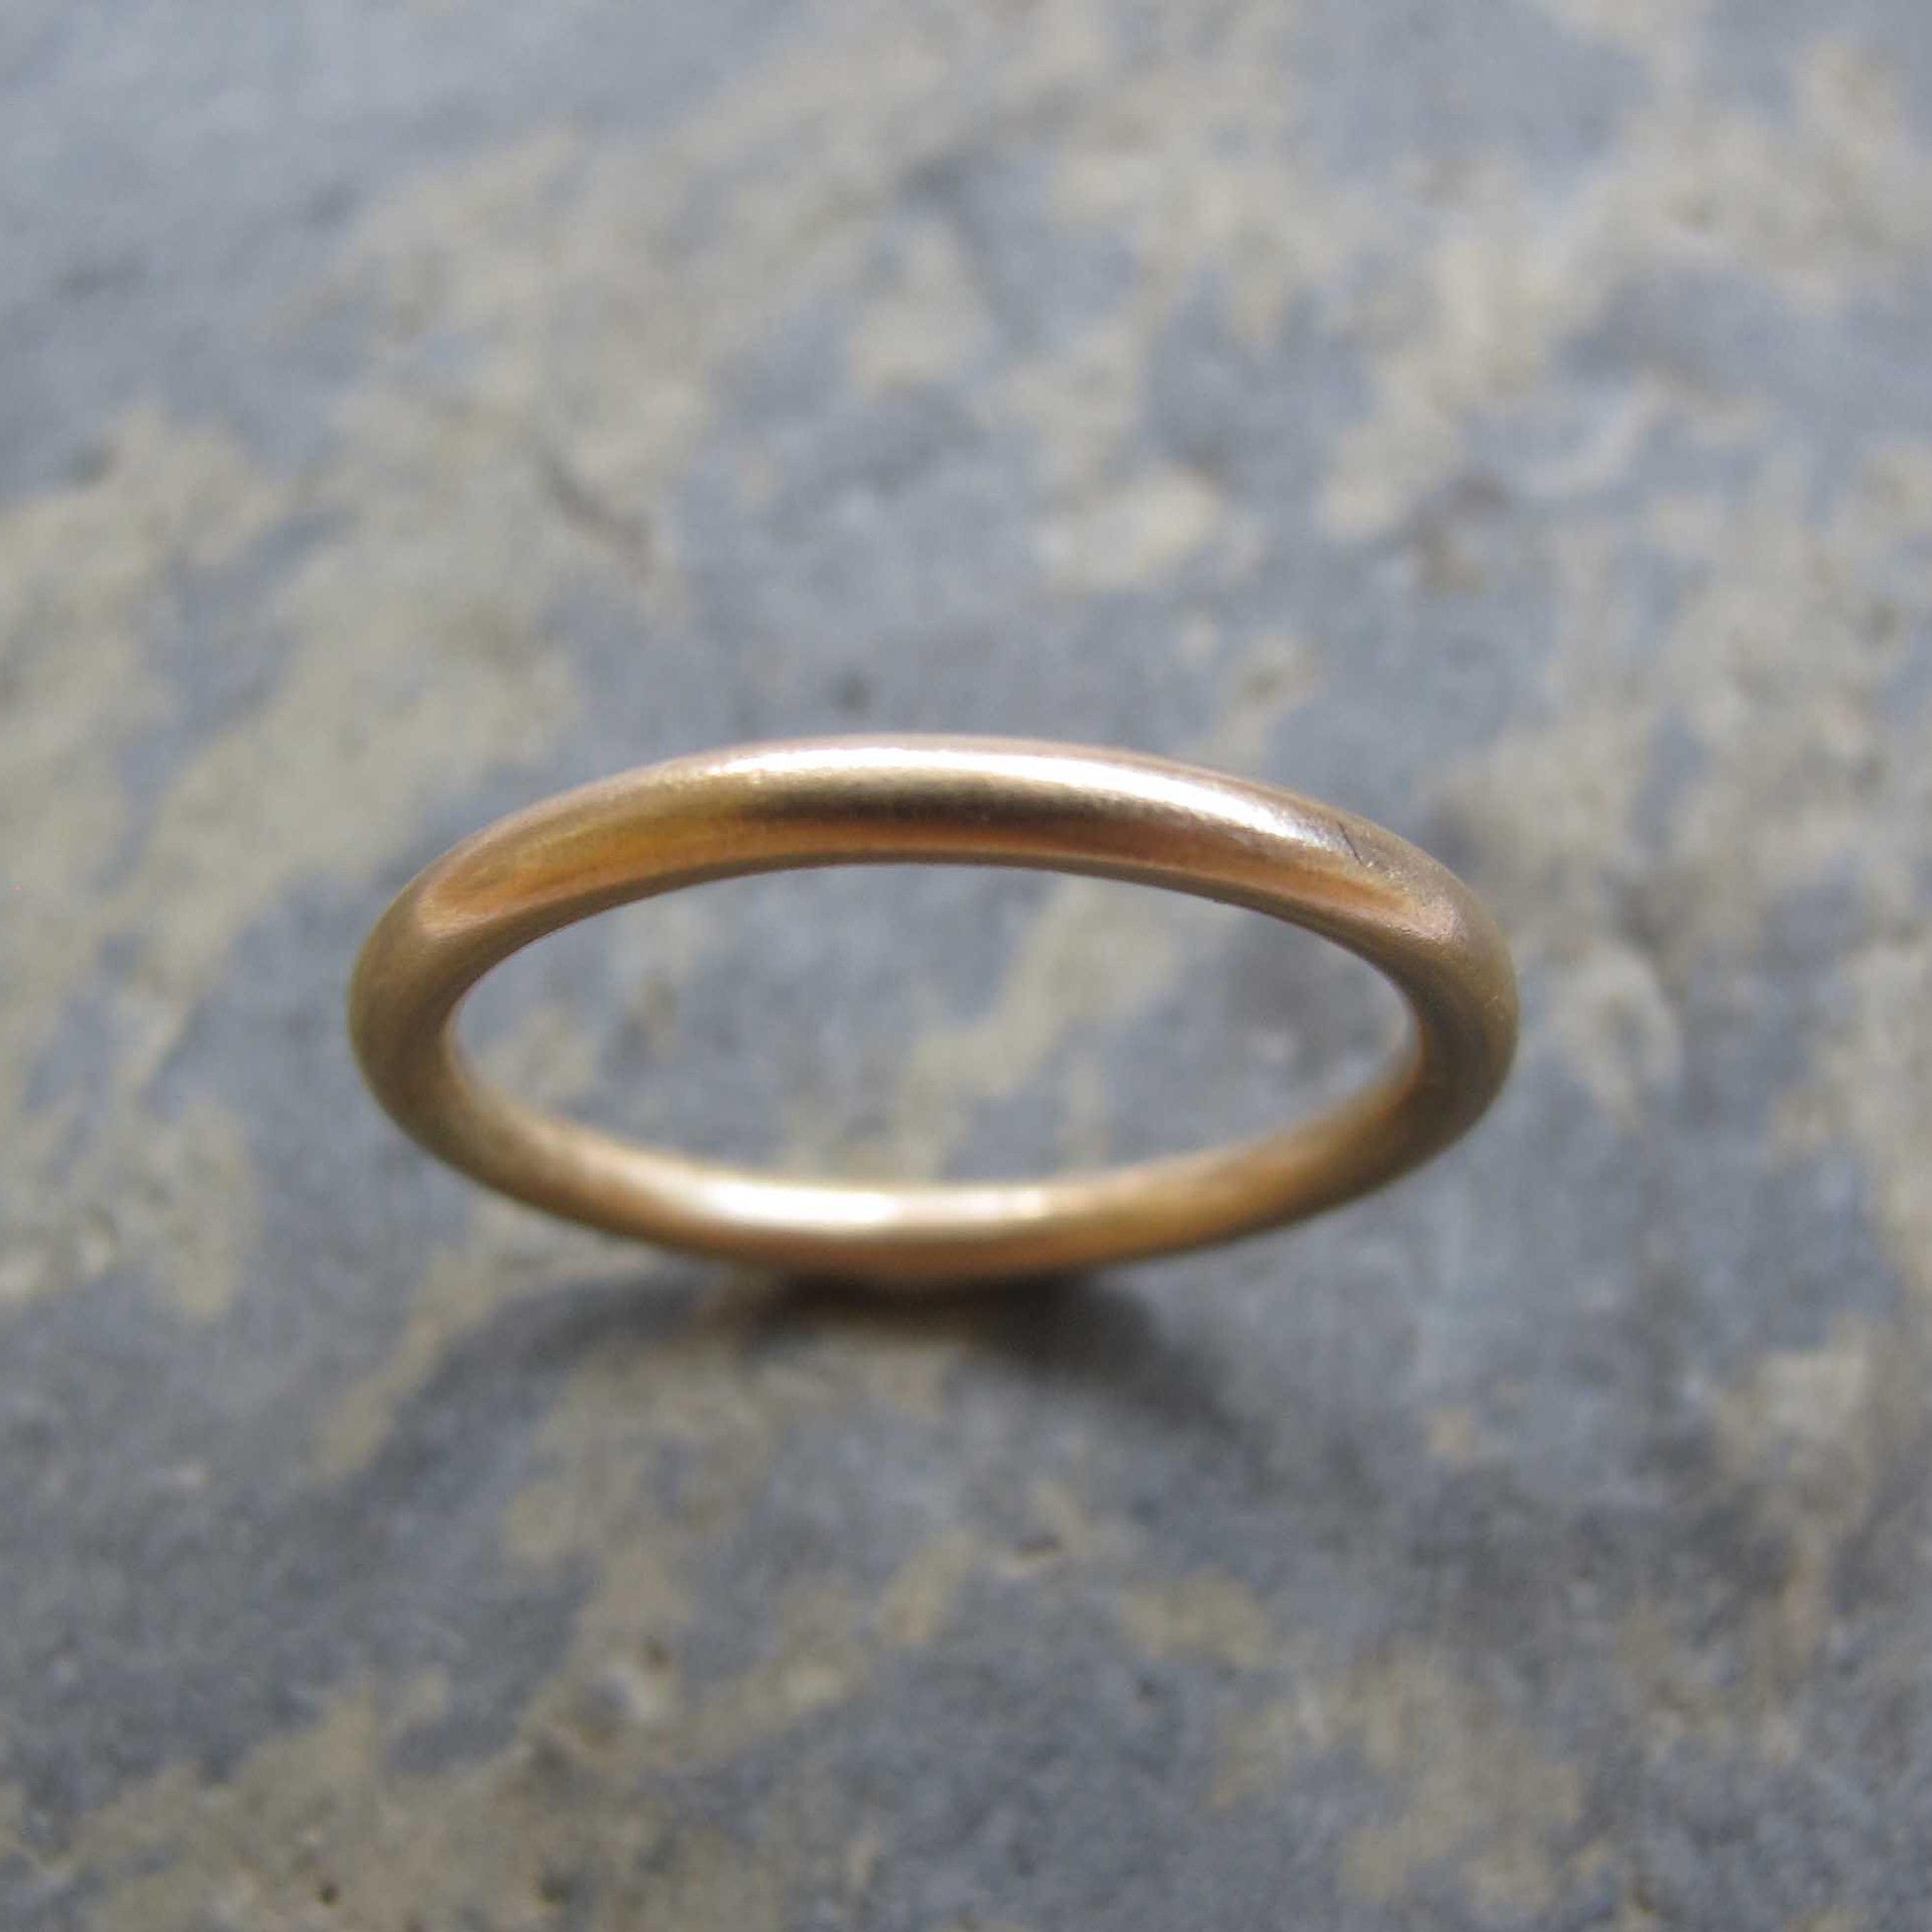 heather stephens jewellery handmade silver gold wedding rings